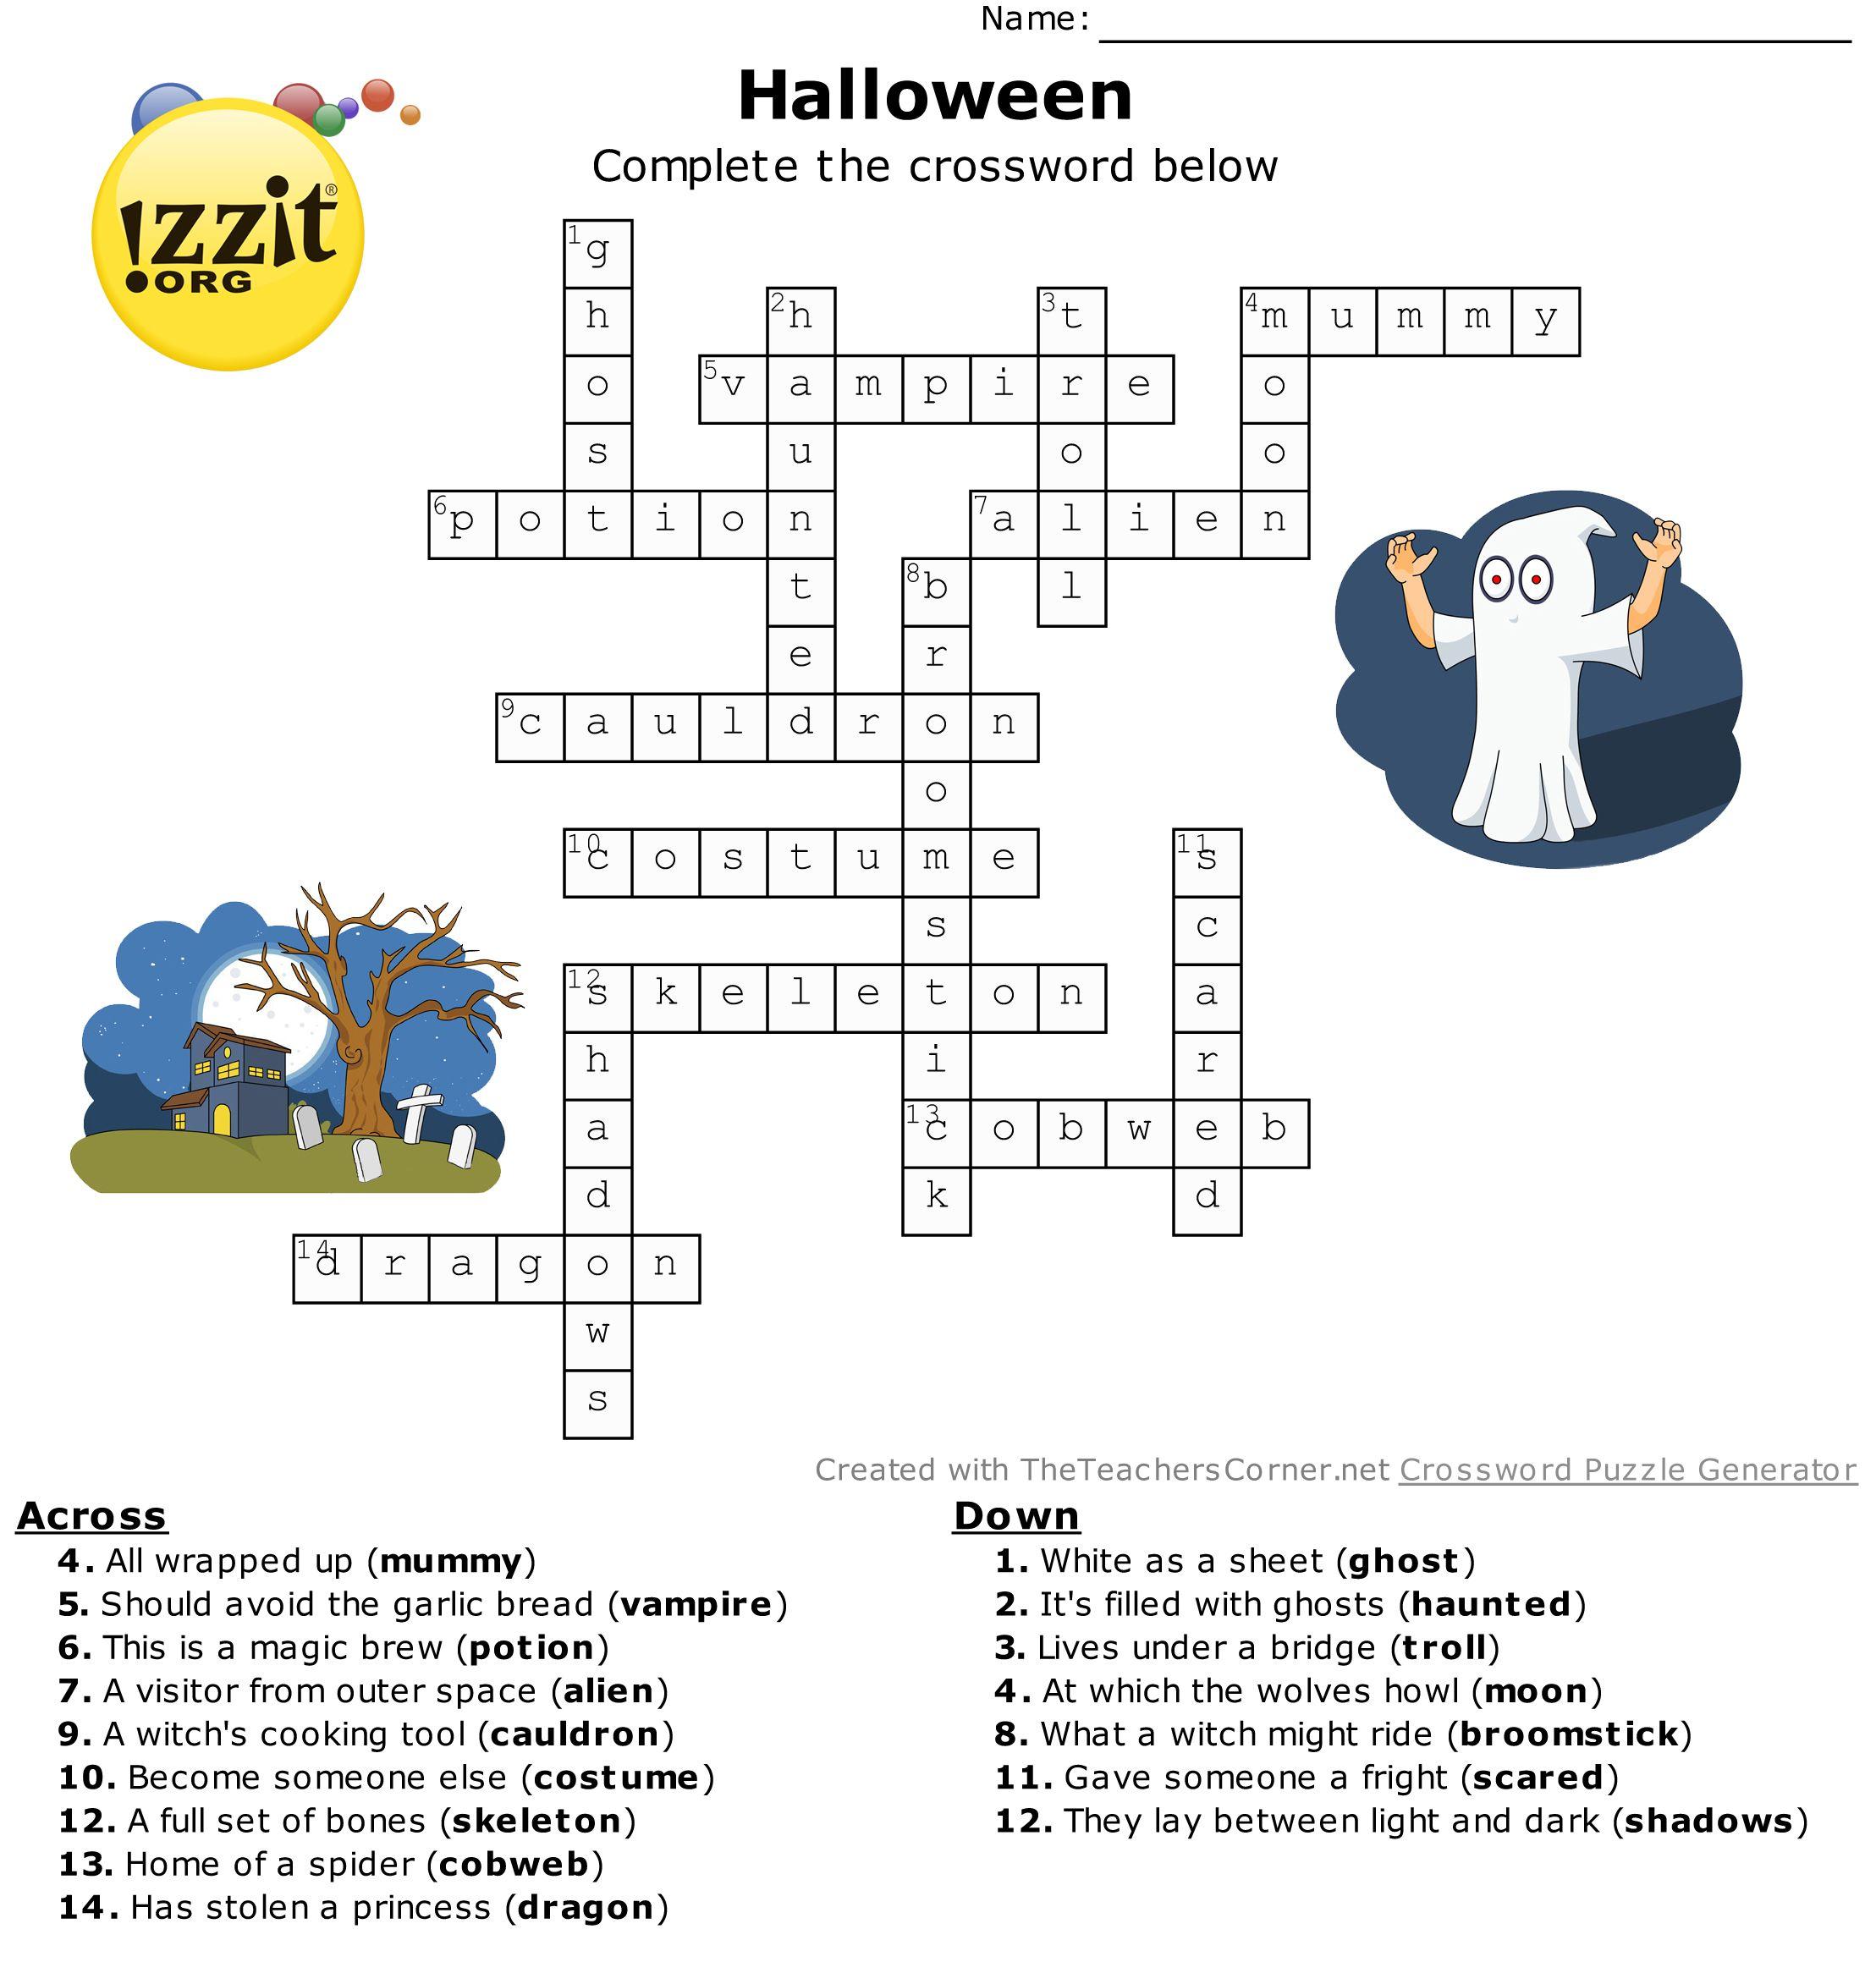 Halloween Crossword Answers Hard HappyHalloween